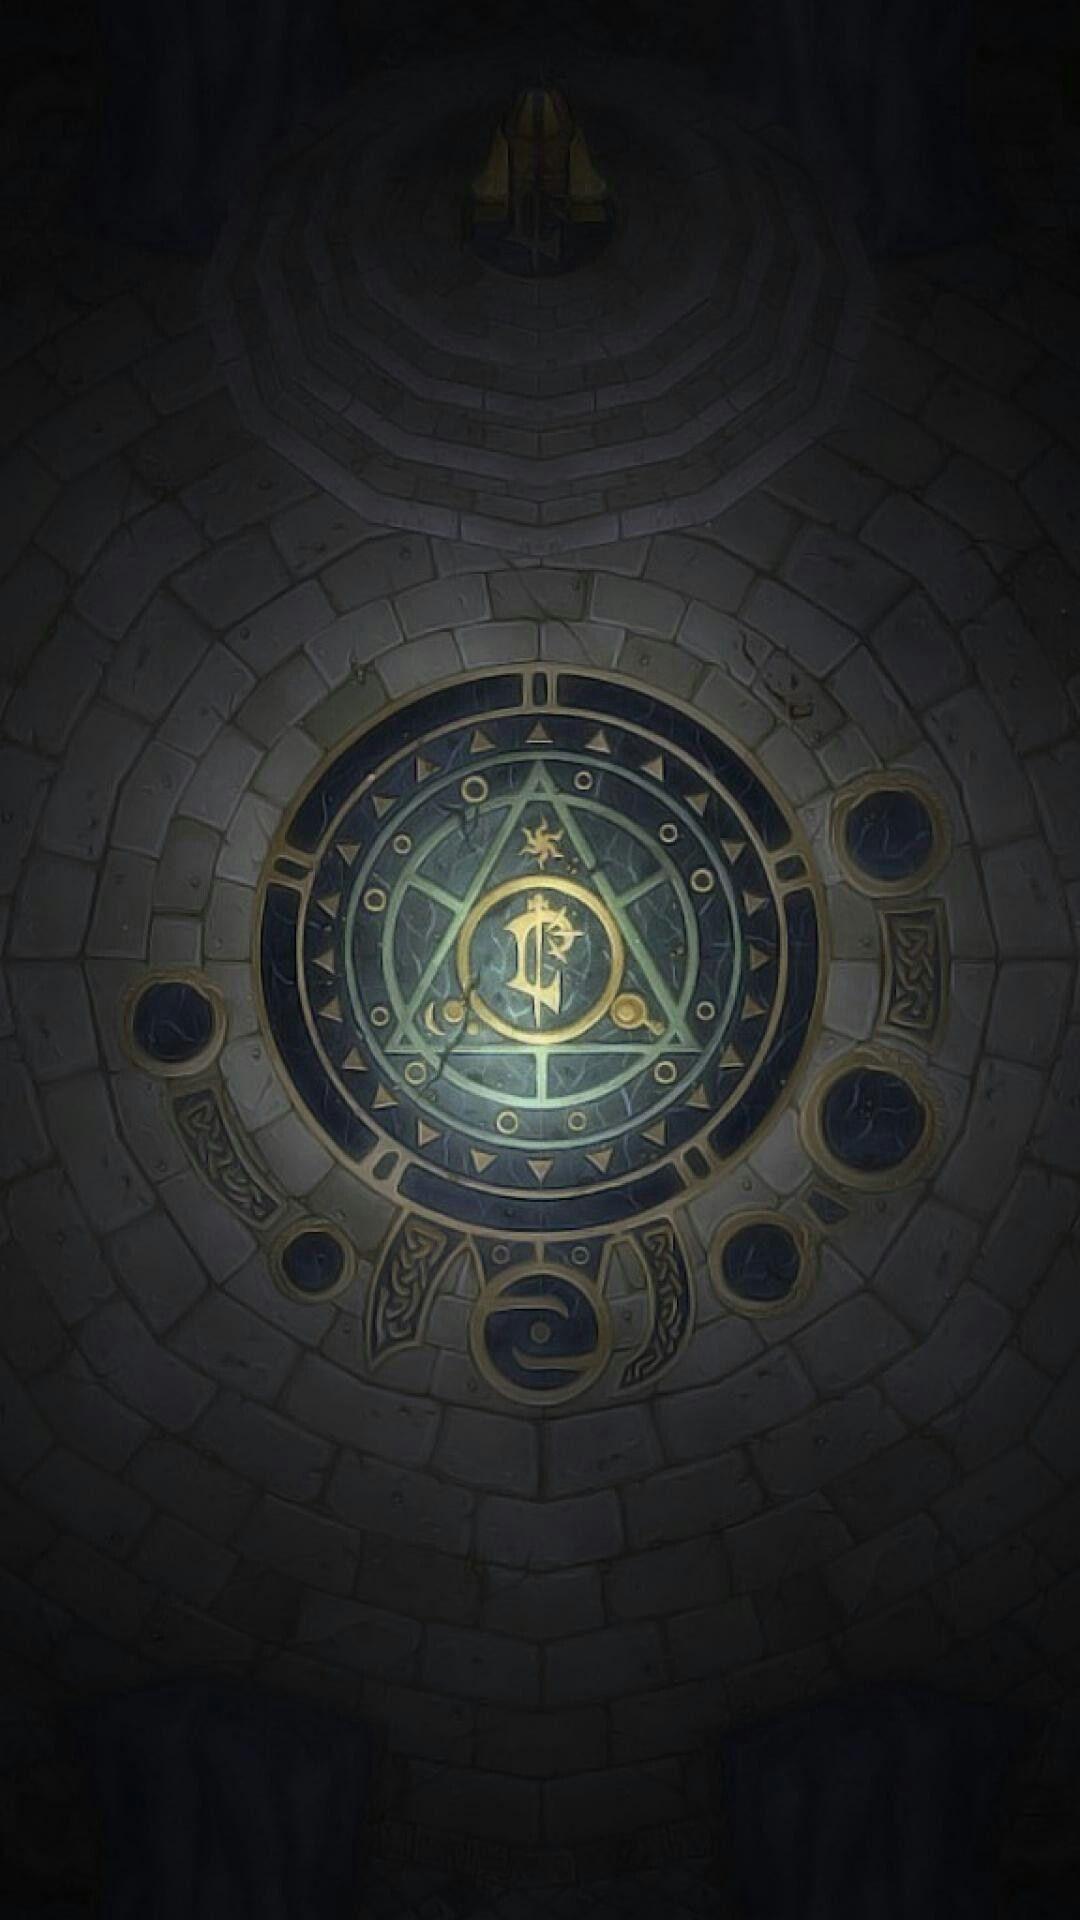 Pin By John Mccloskey On Phone Wallpapers World Of Warcraft